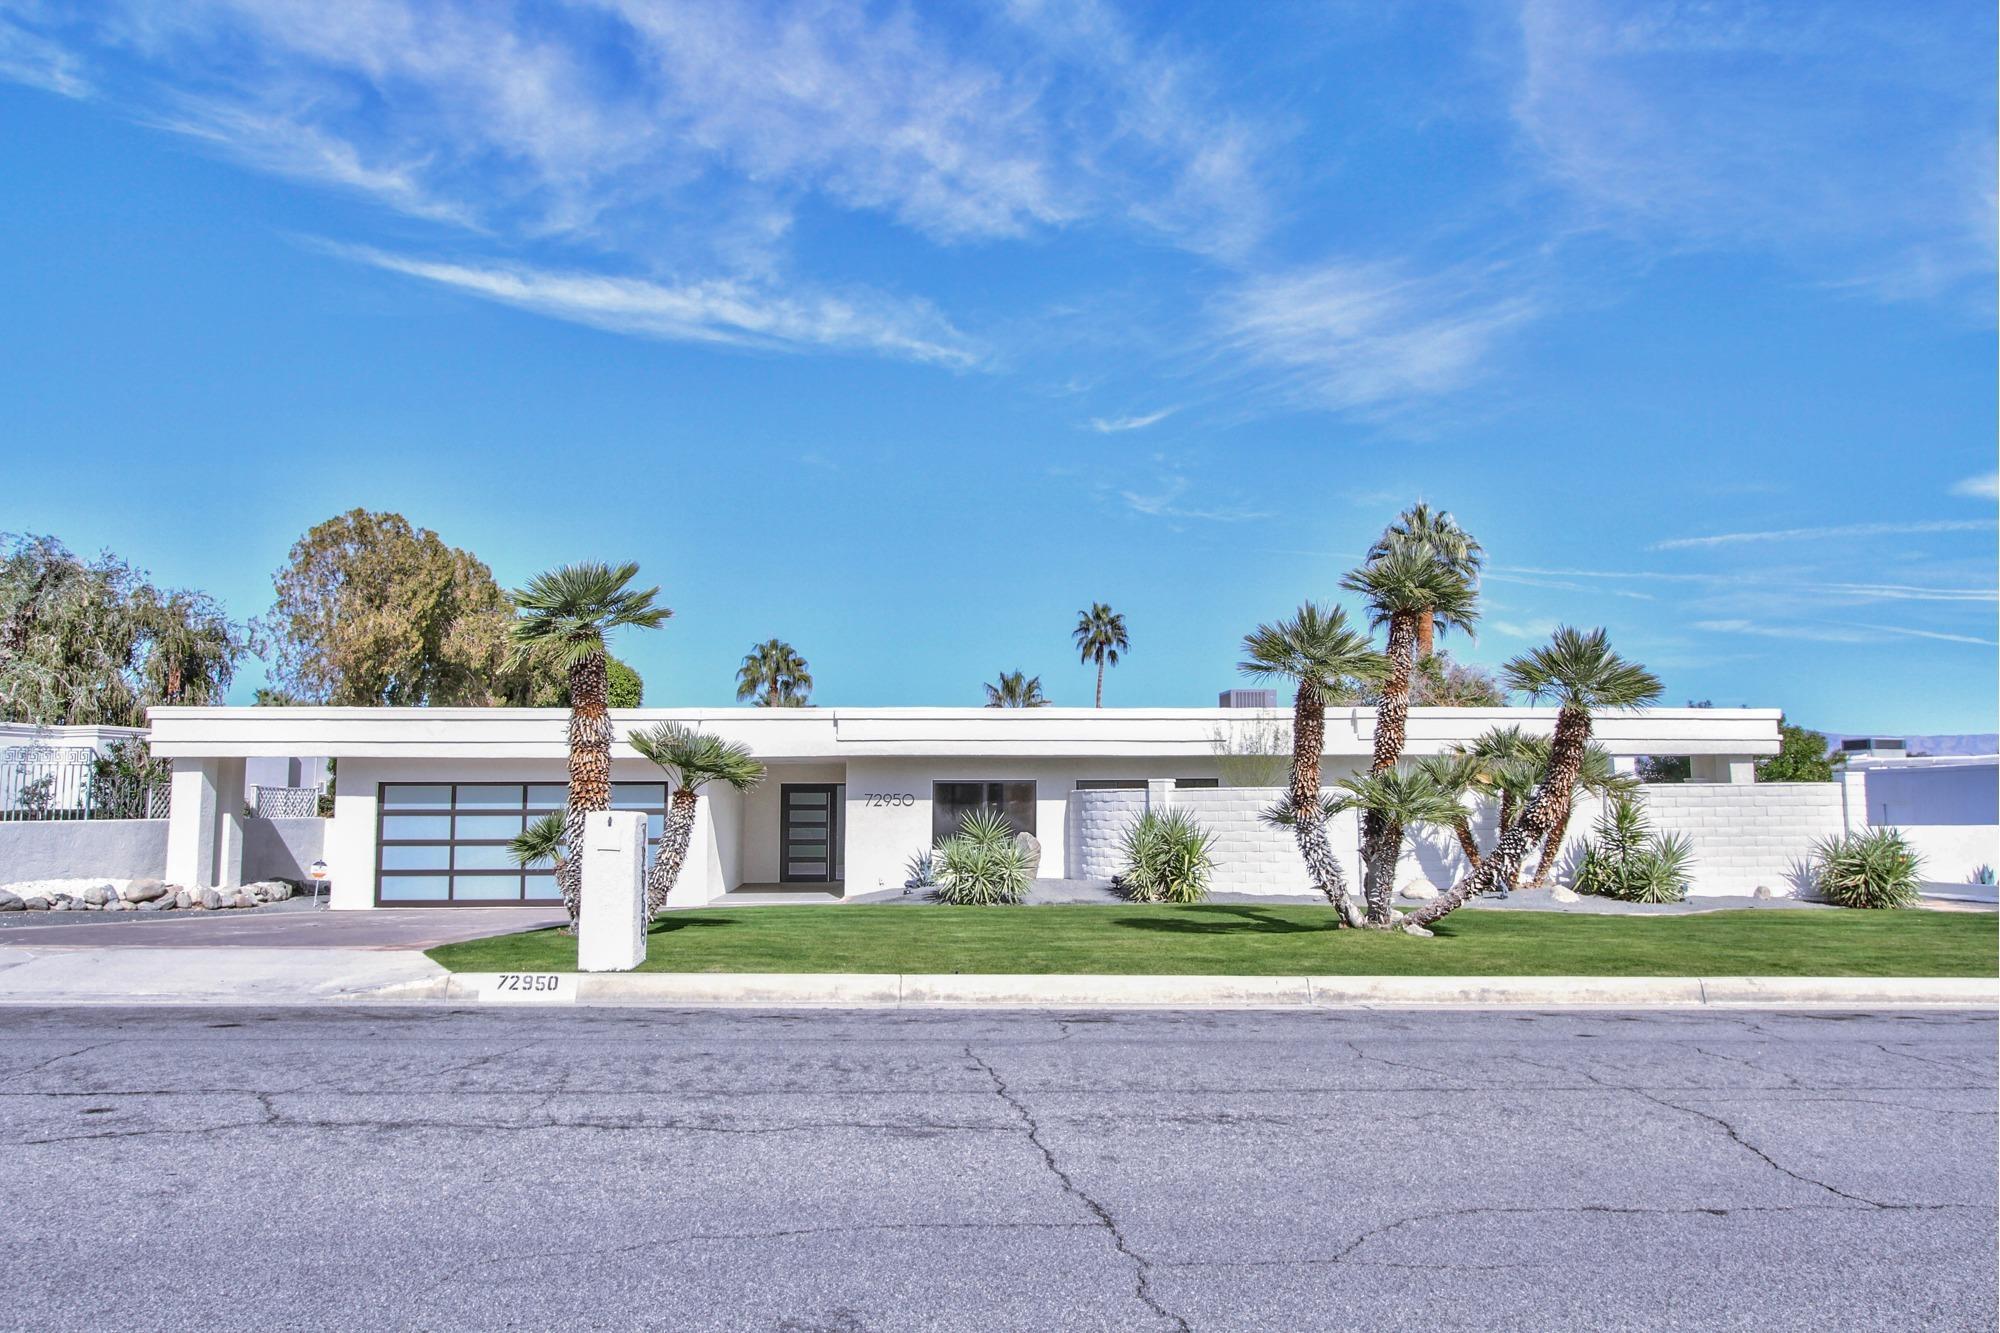 Photo of 72950 Homestead Road, Palm Desert, CA 92260